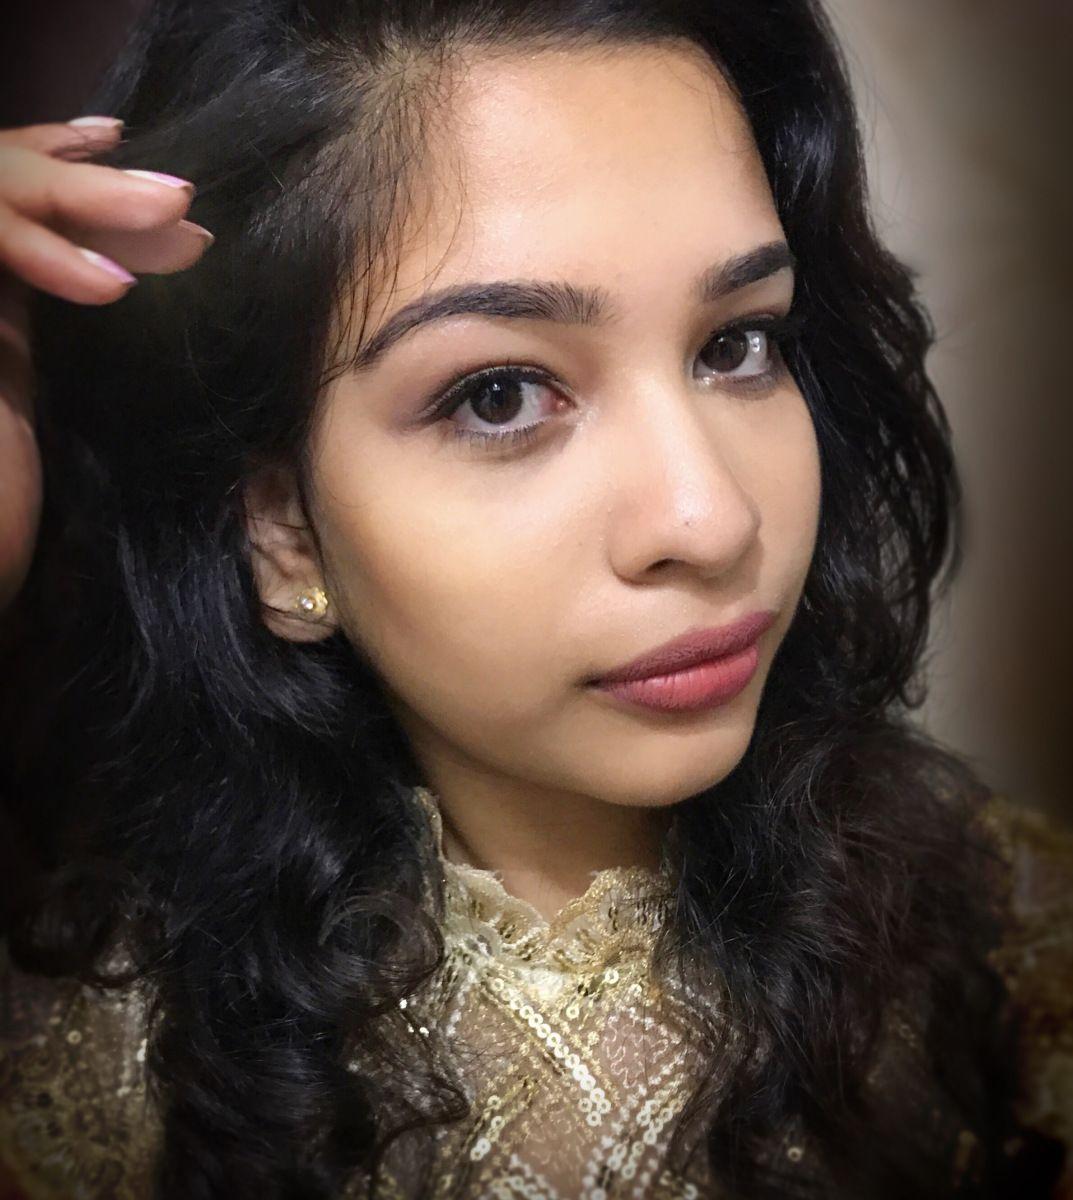 Get the look 💛 step by step makeup tutorial Makeup looks